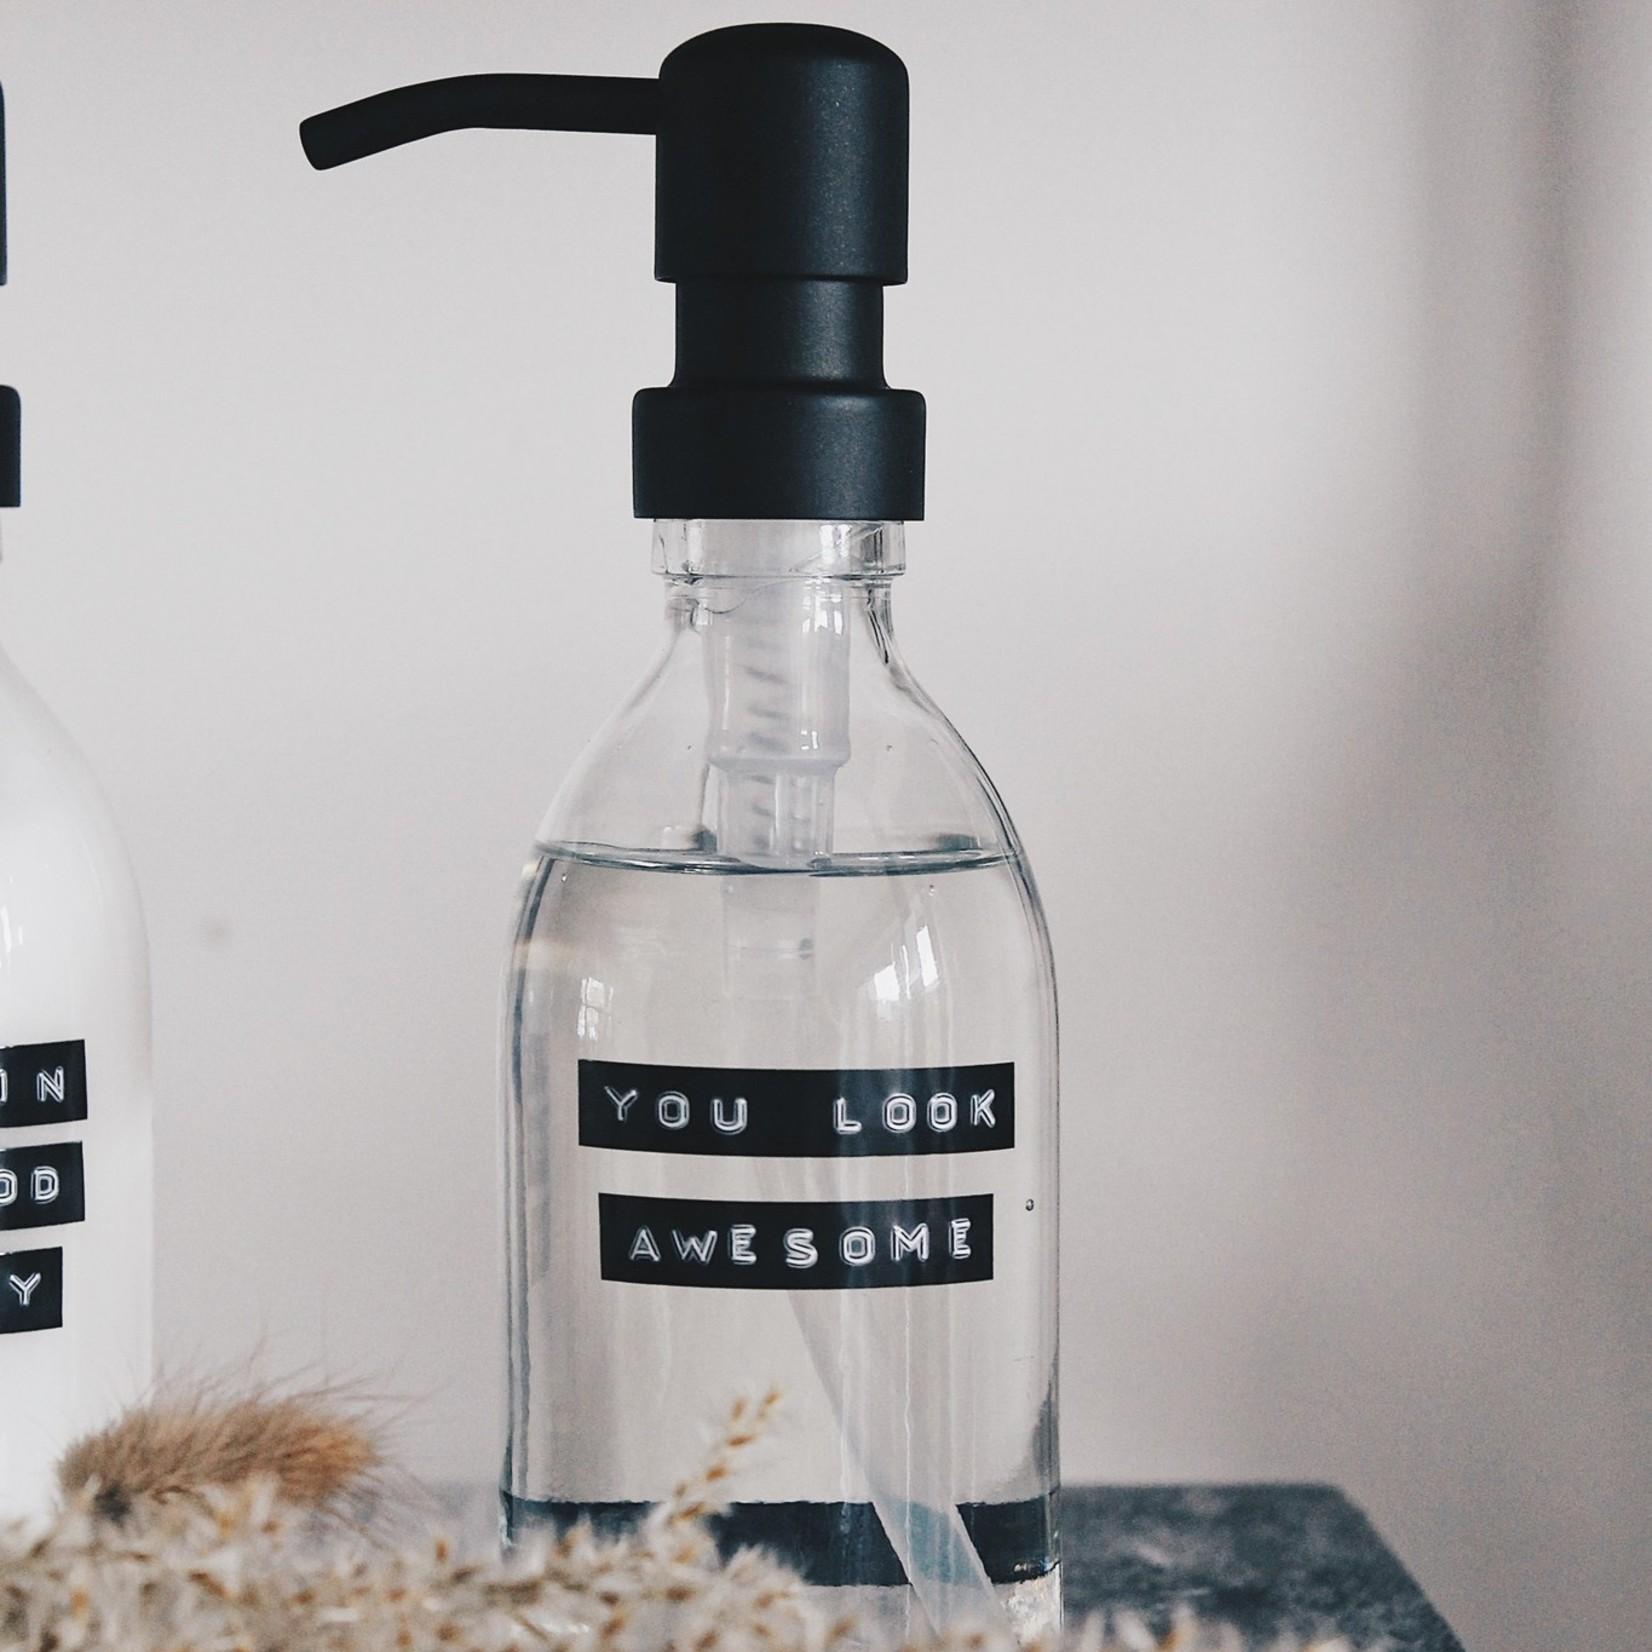 Wellmark Handzeep 'You look awesome' -Frisse linnen